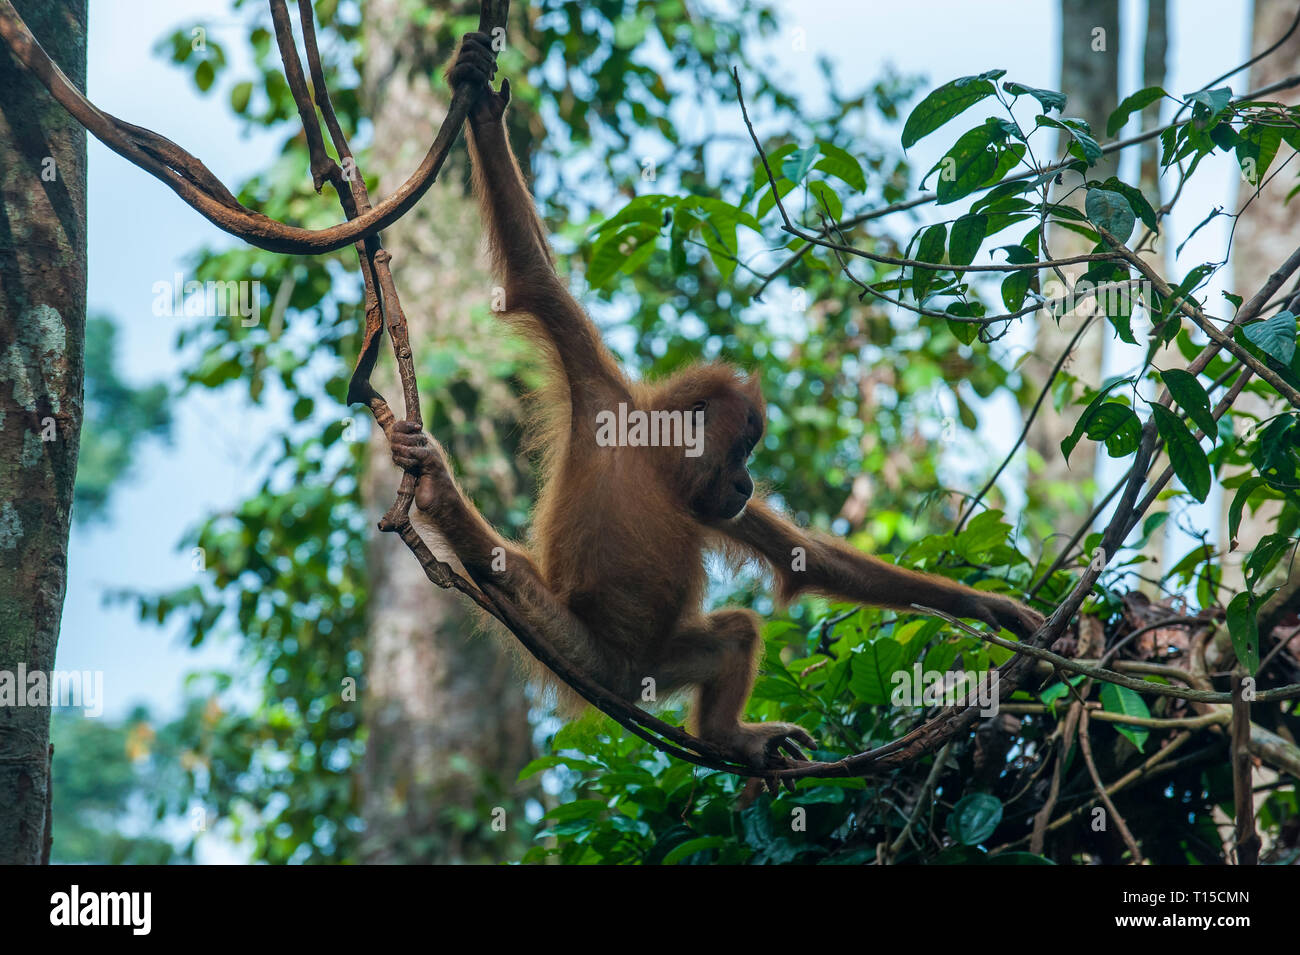 Indonesia, Sumatra, Bukit Lawang Orang Utan Rehabilitation station, Young Sumatran orangutan baby swinging through the forest Stock Photo